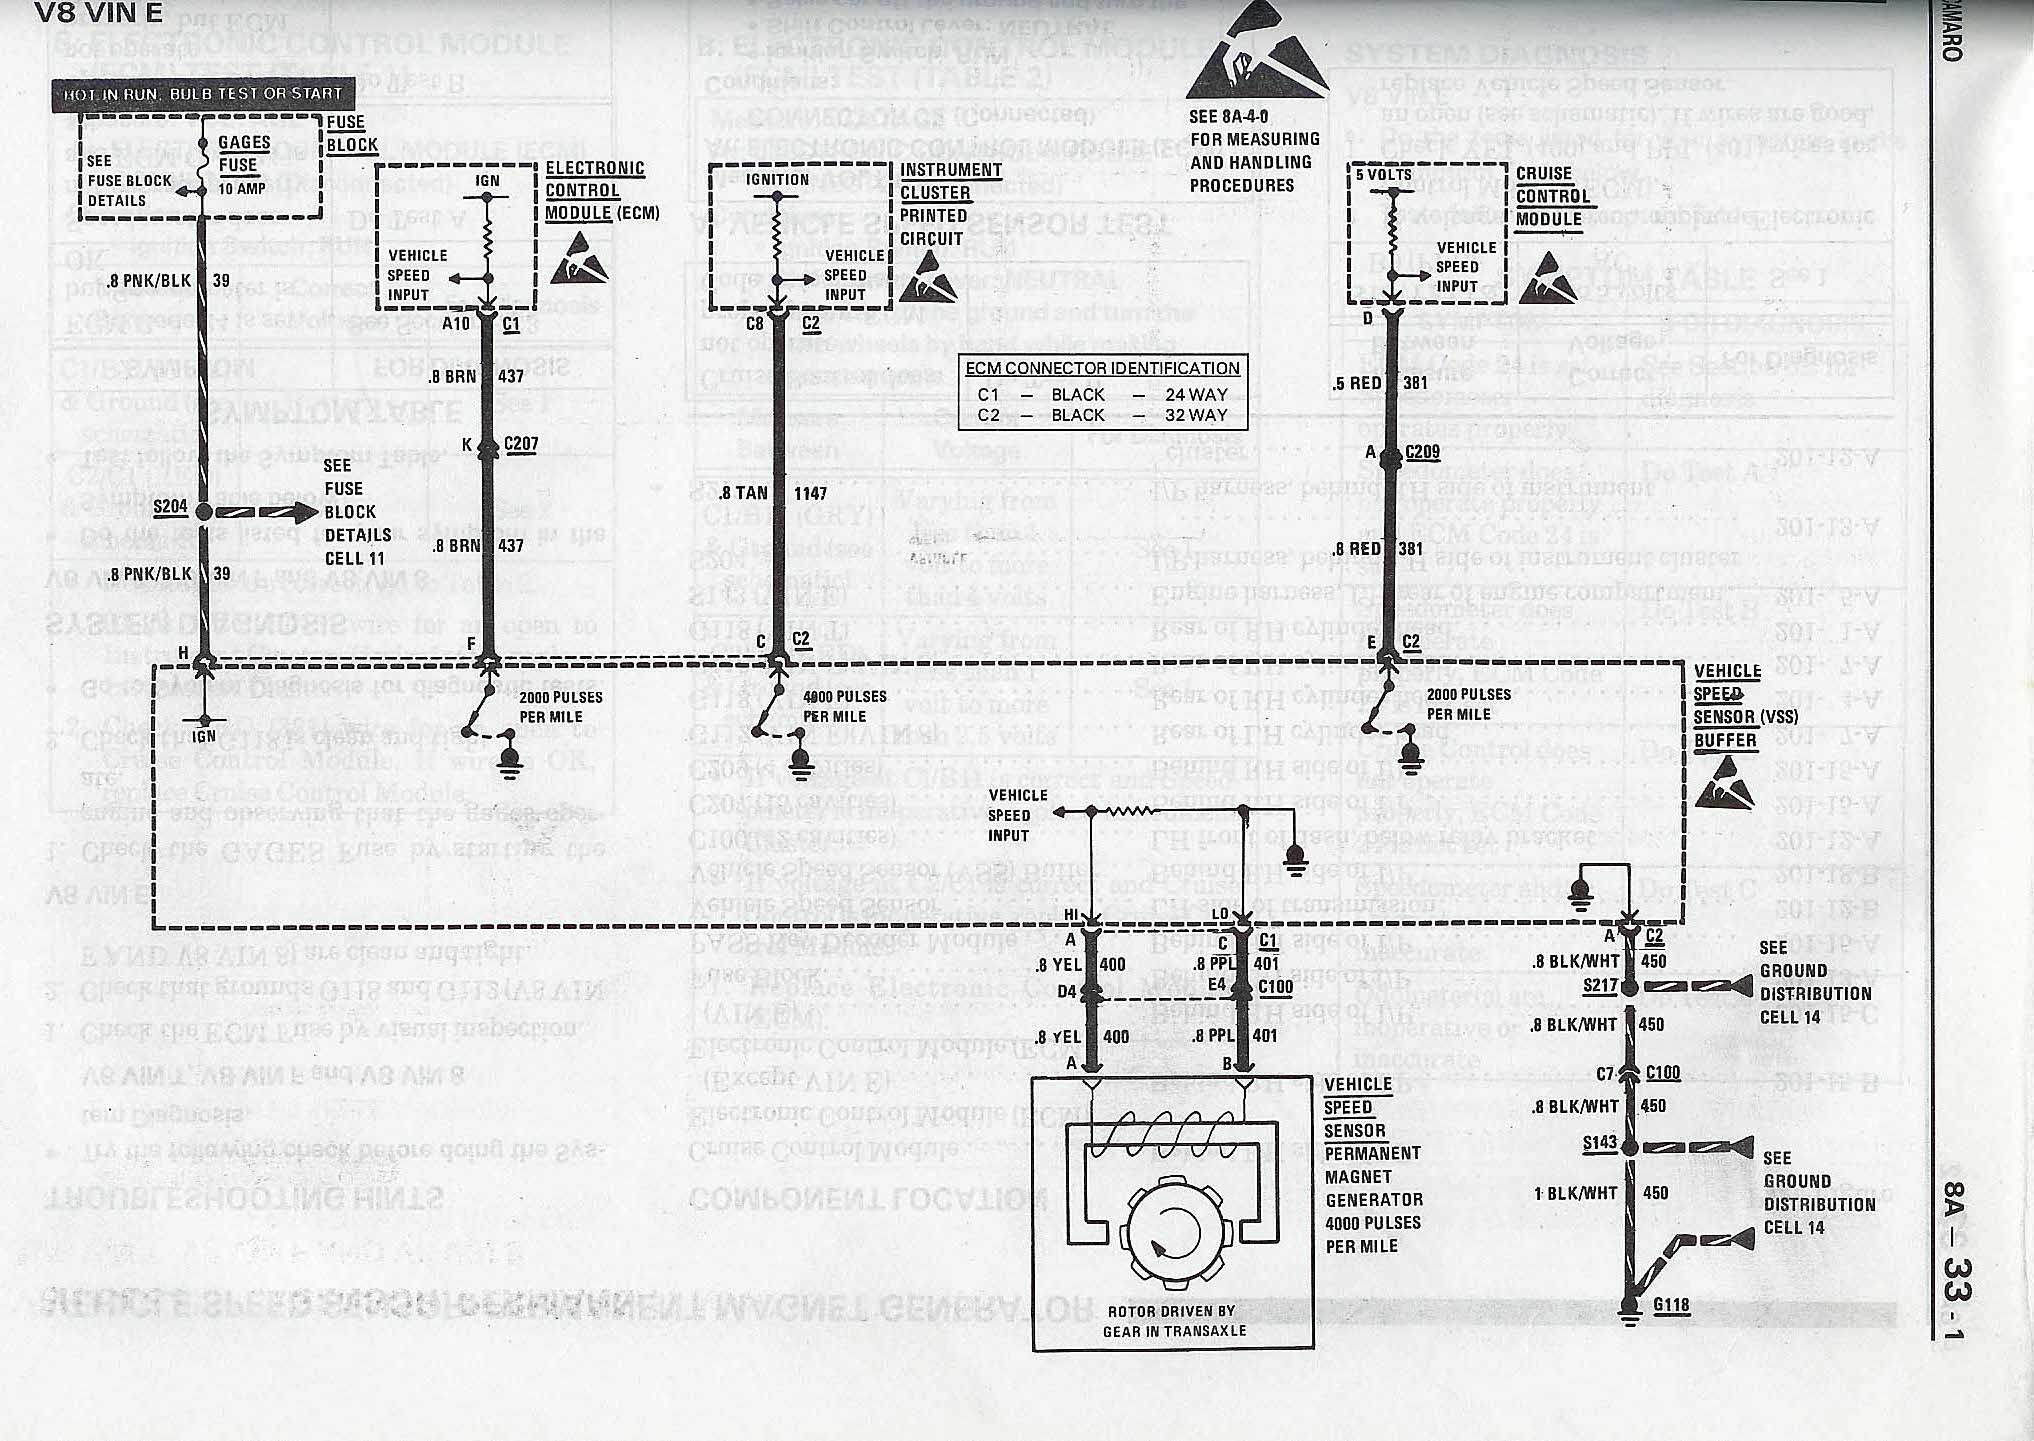 Vss Wiring Verification Help